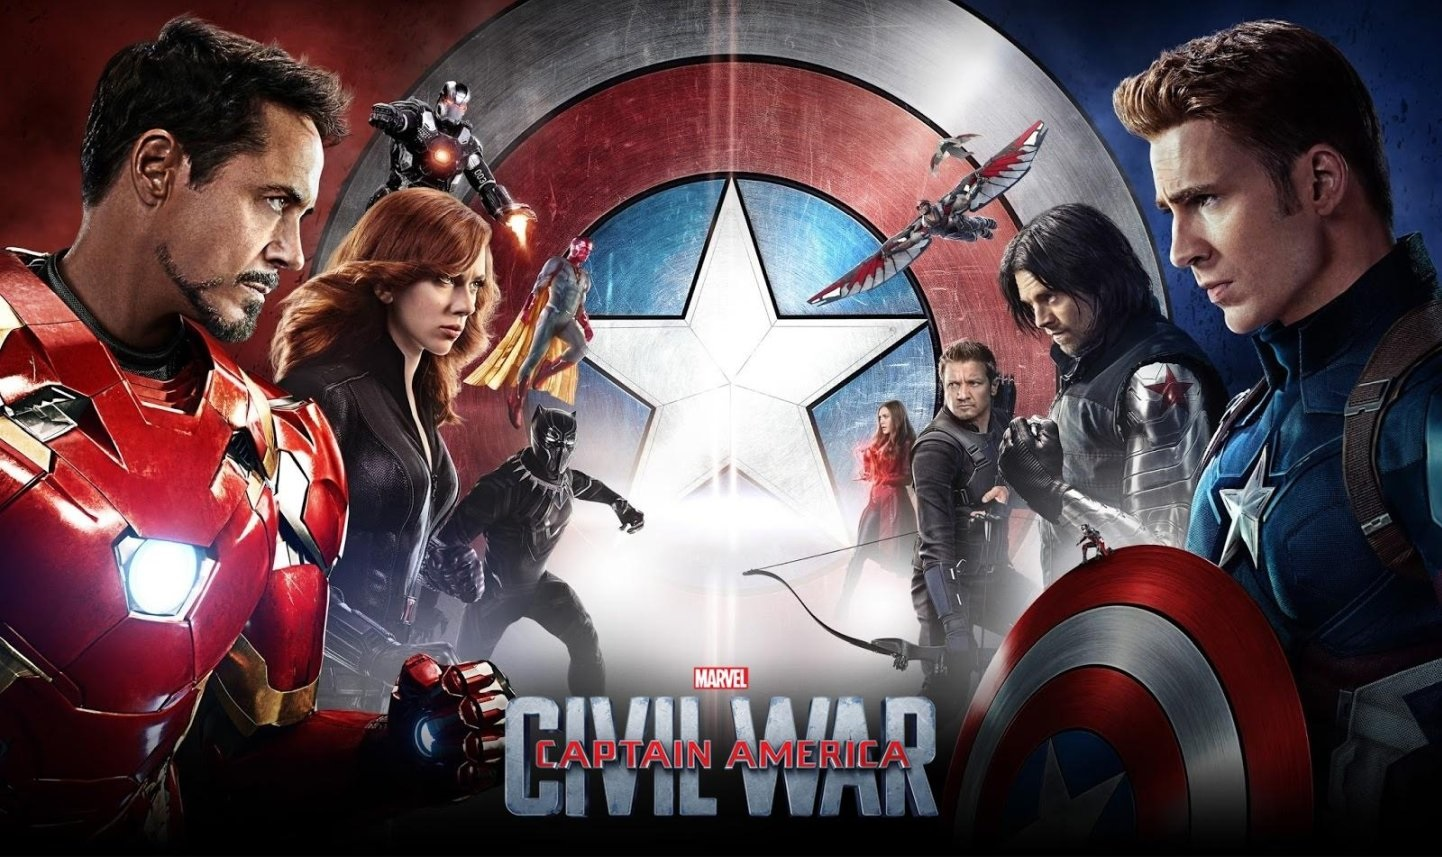 Avengers: Endgame; screenshot: Captain America Civil War